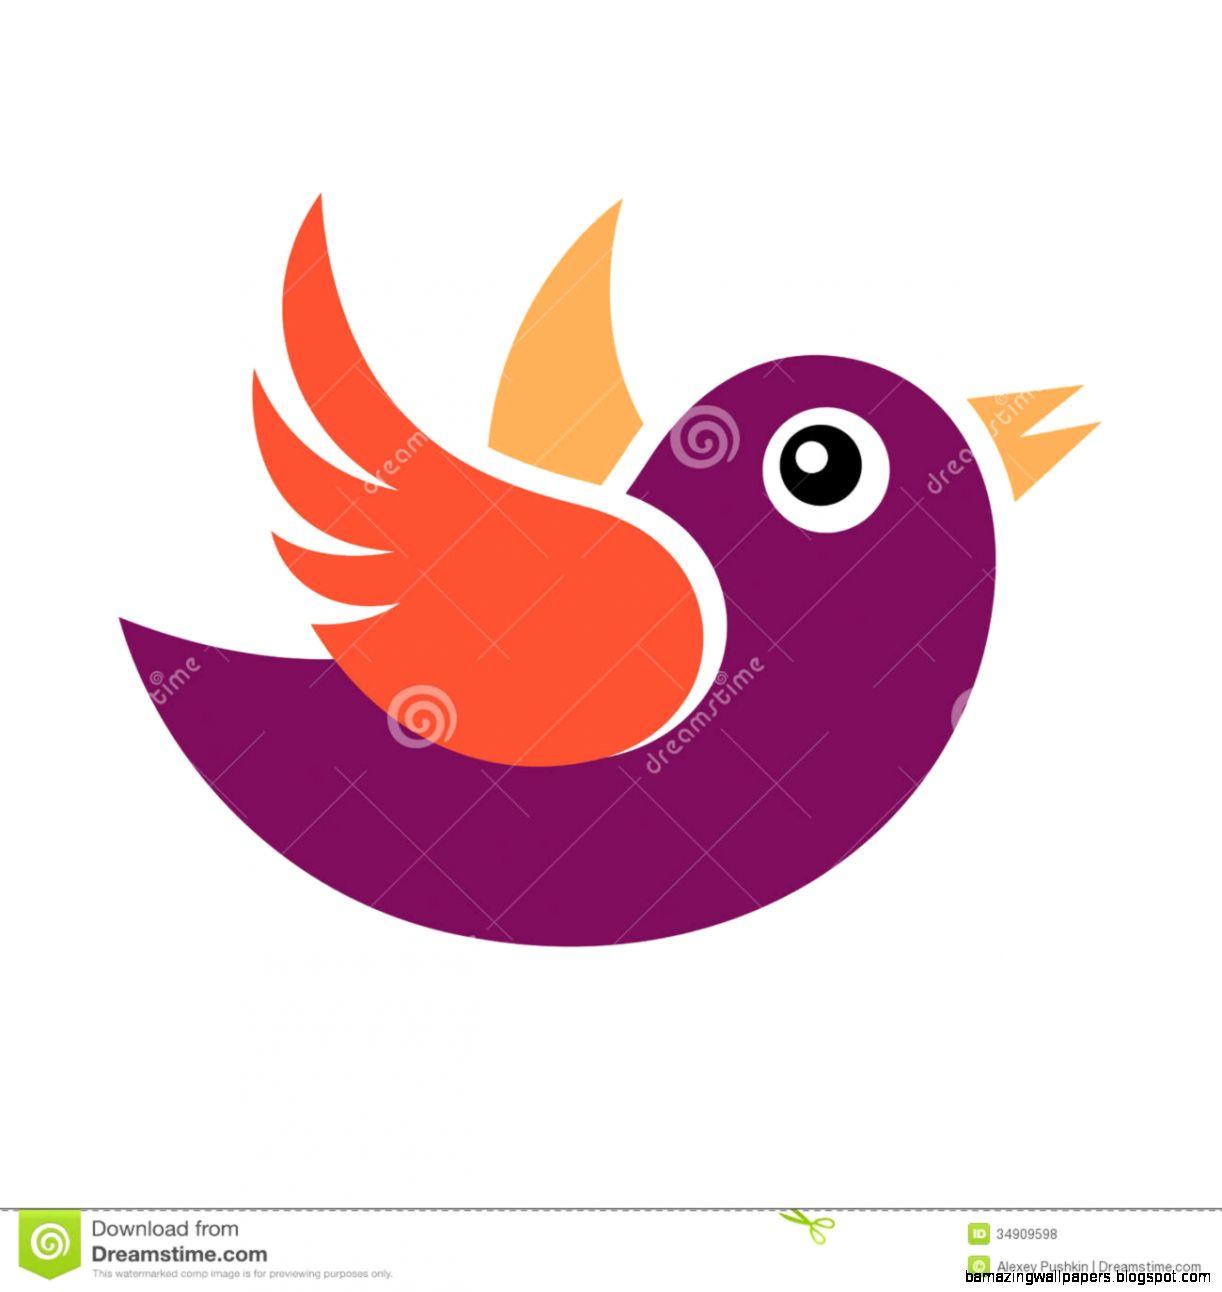 Bird Royalty Free Stock Photos   Image 34909598